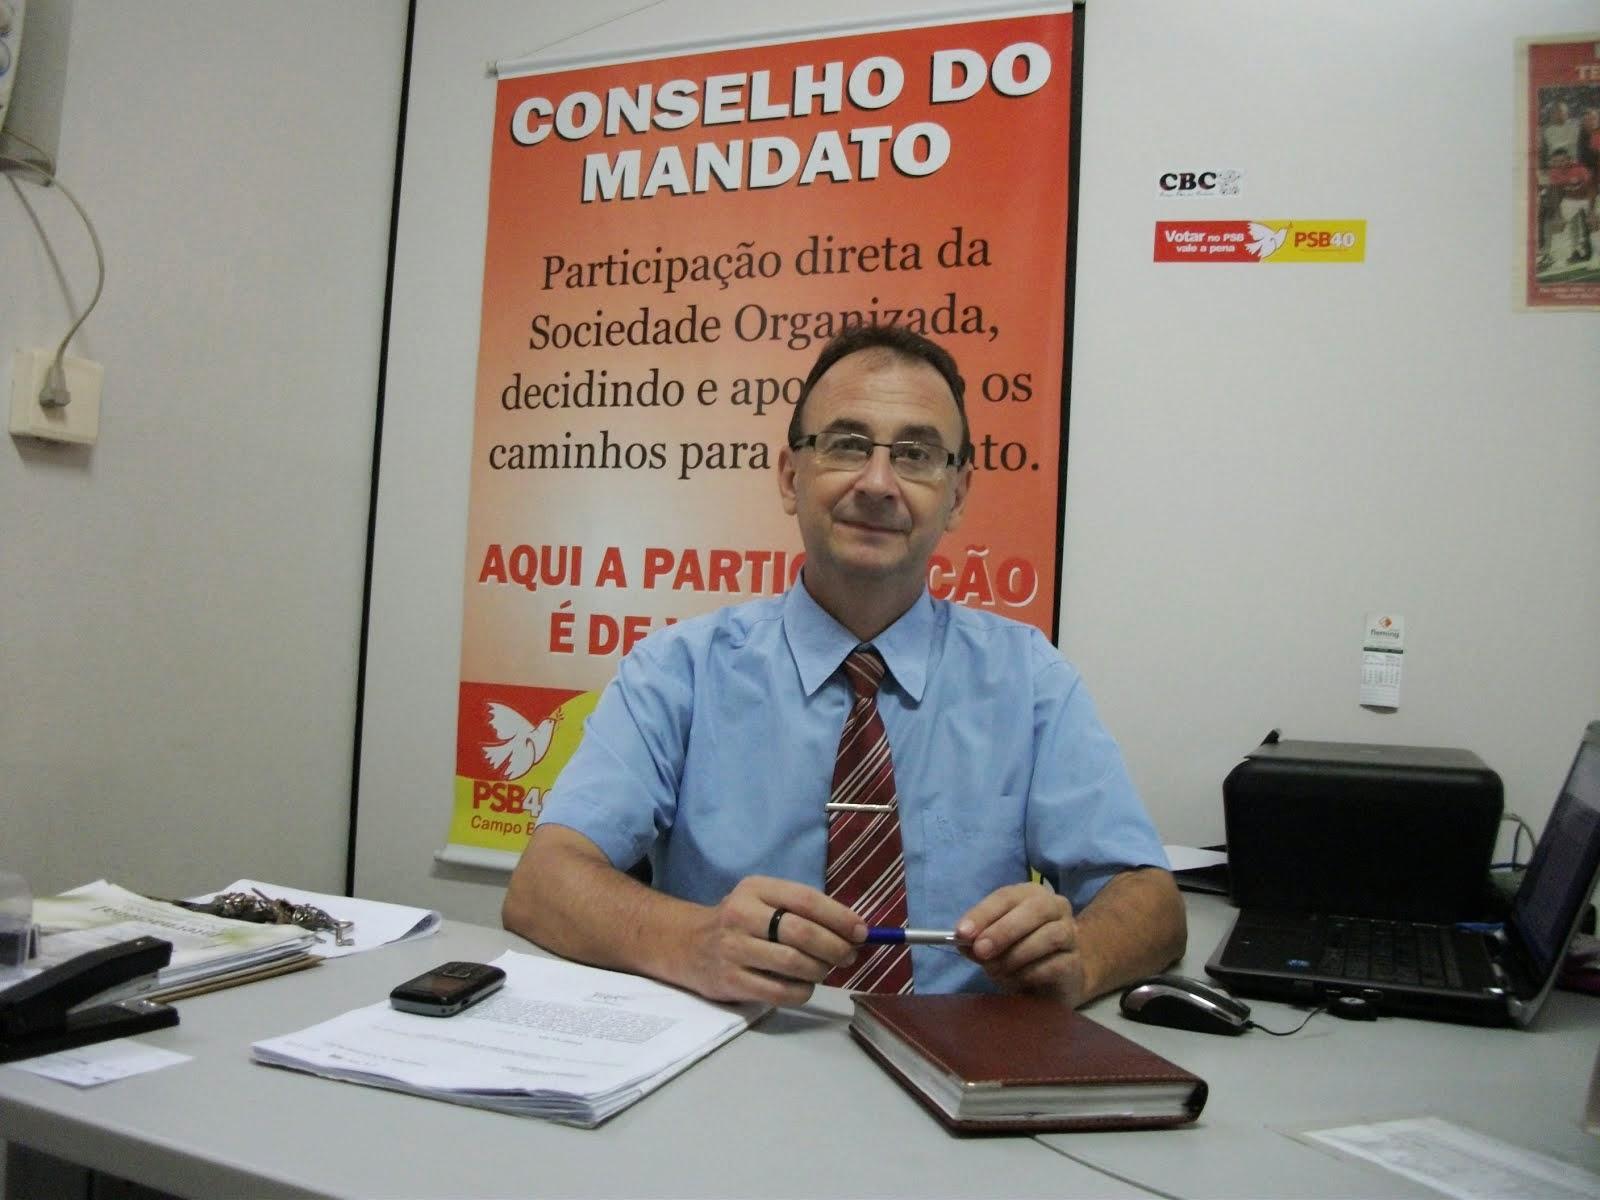 BANCADA DO GOVERNO (PMDB, PP e PPS) REPROVA PROJETO